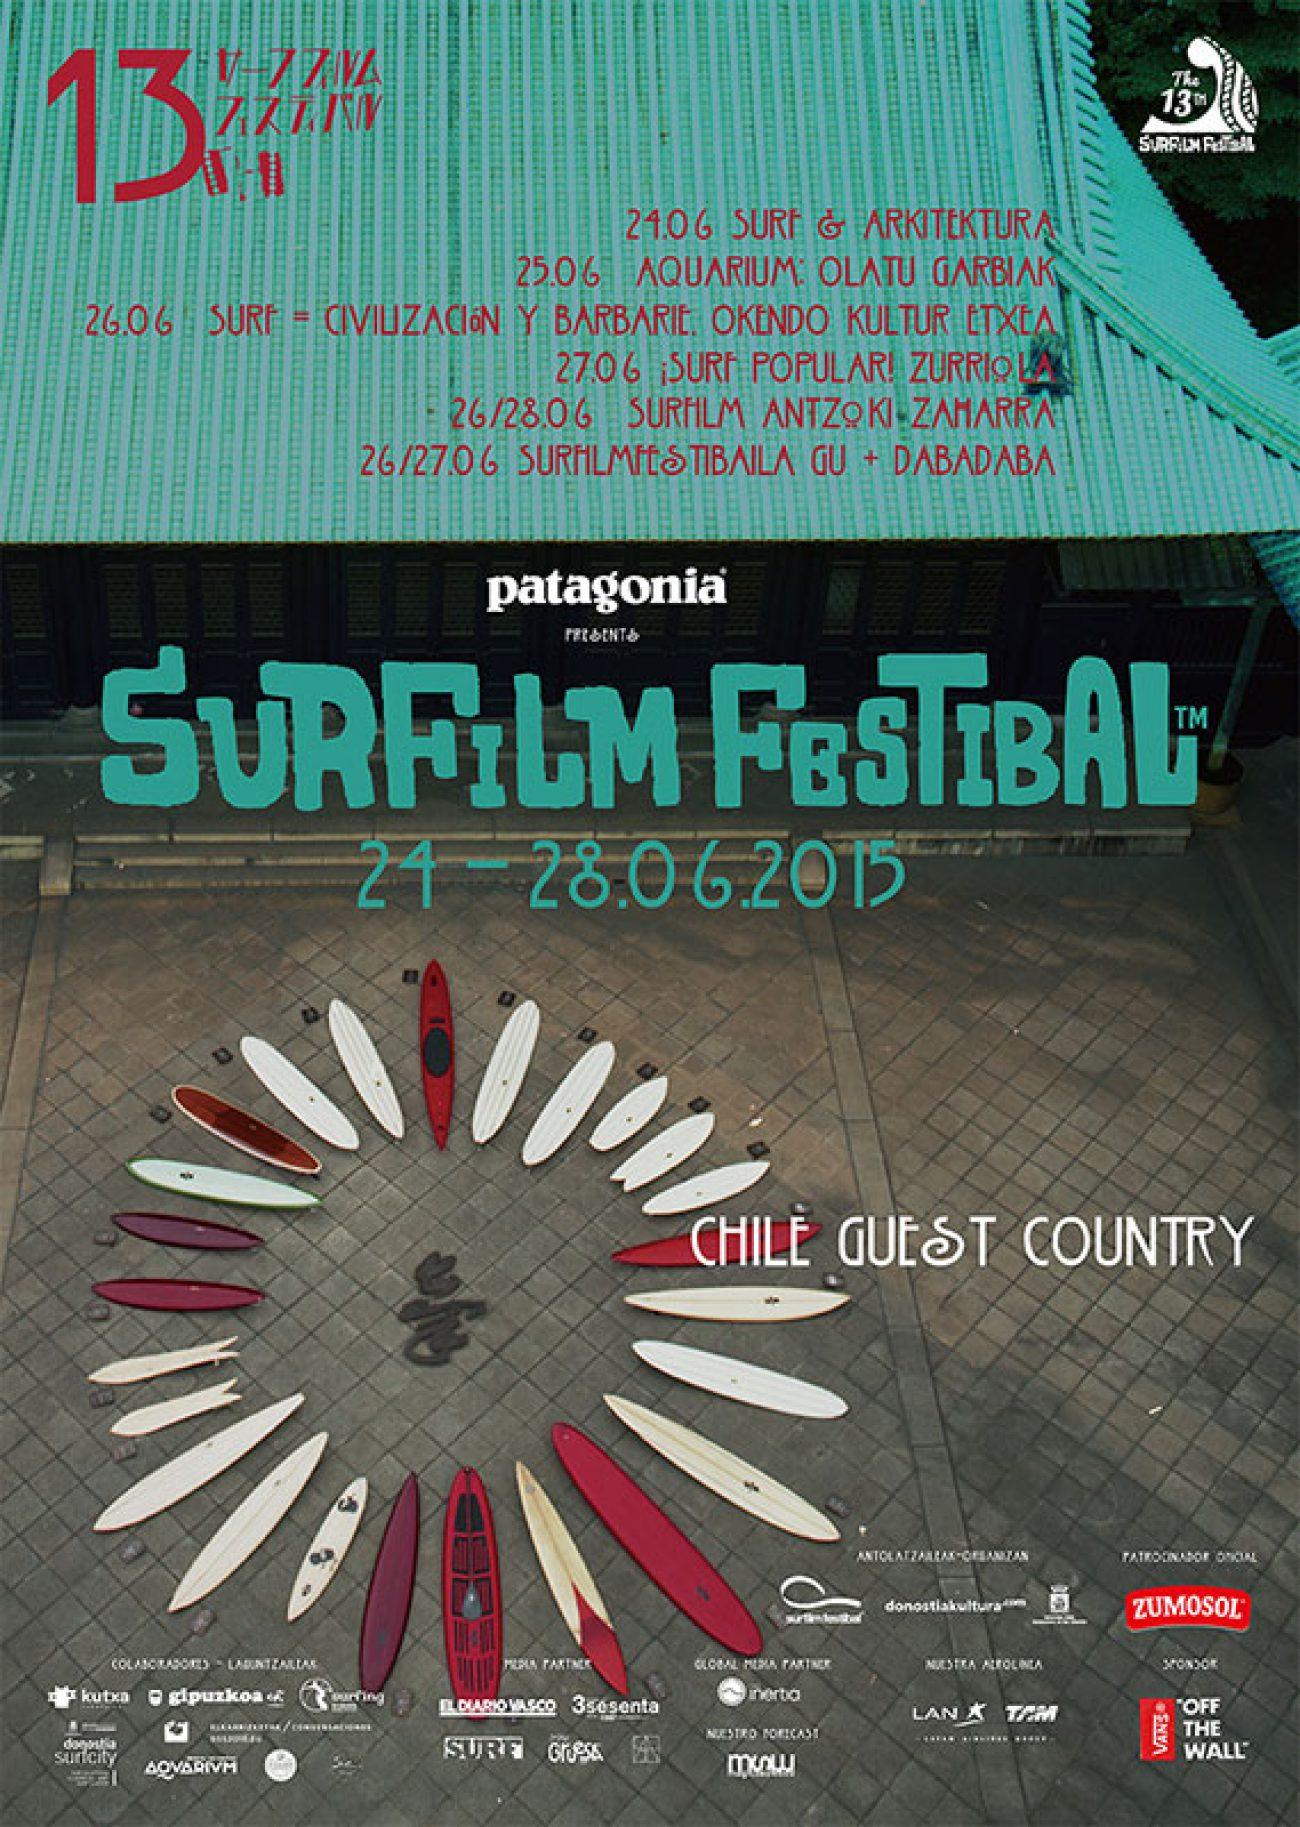 Surfilmfestibal13_poster_web